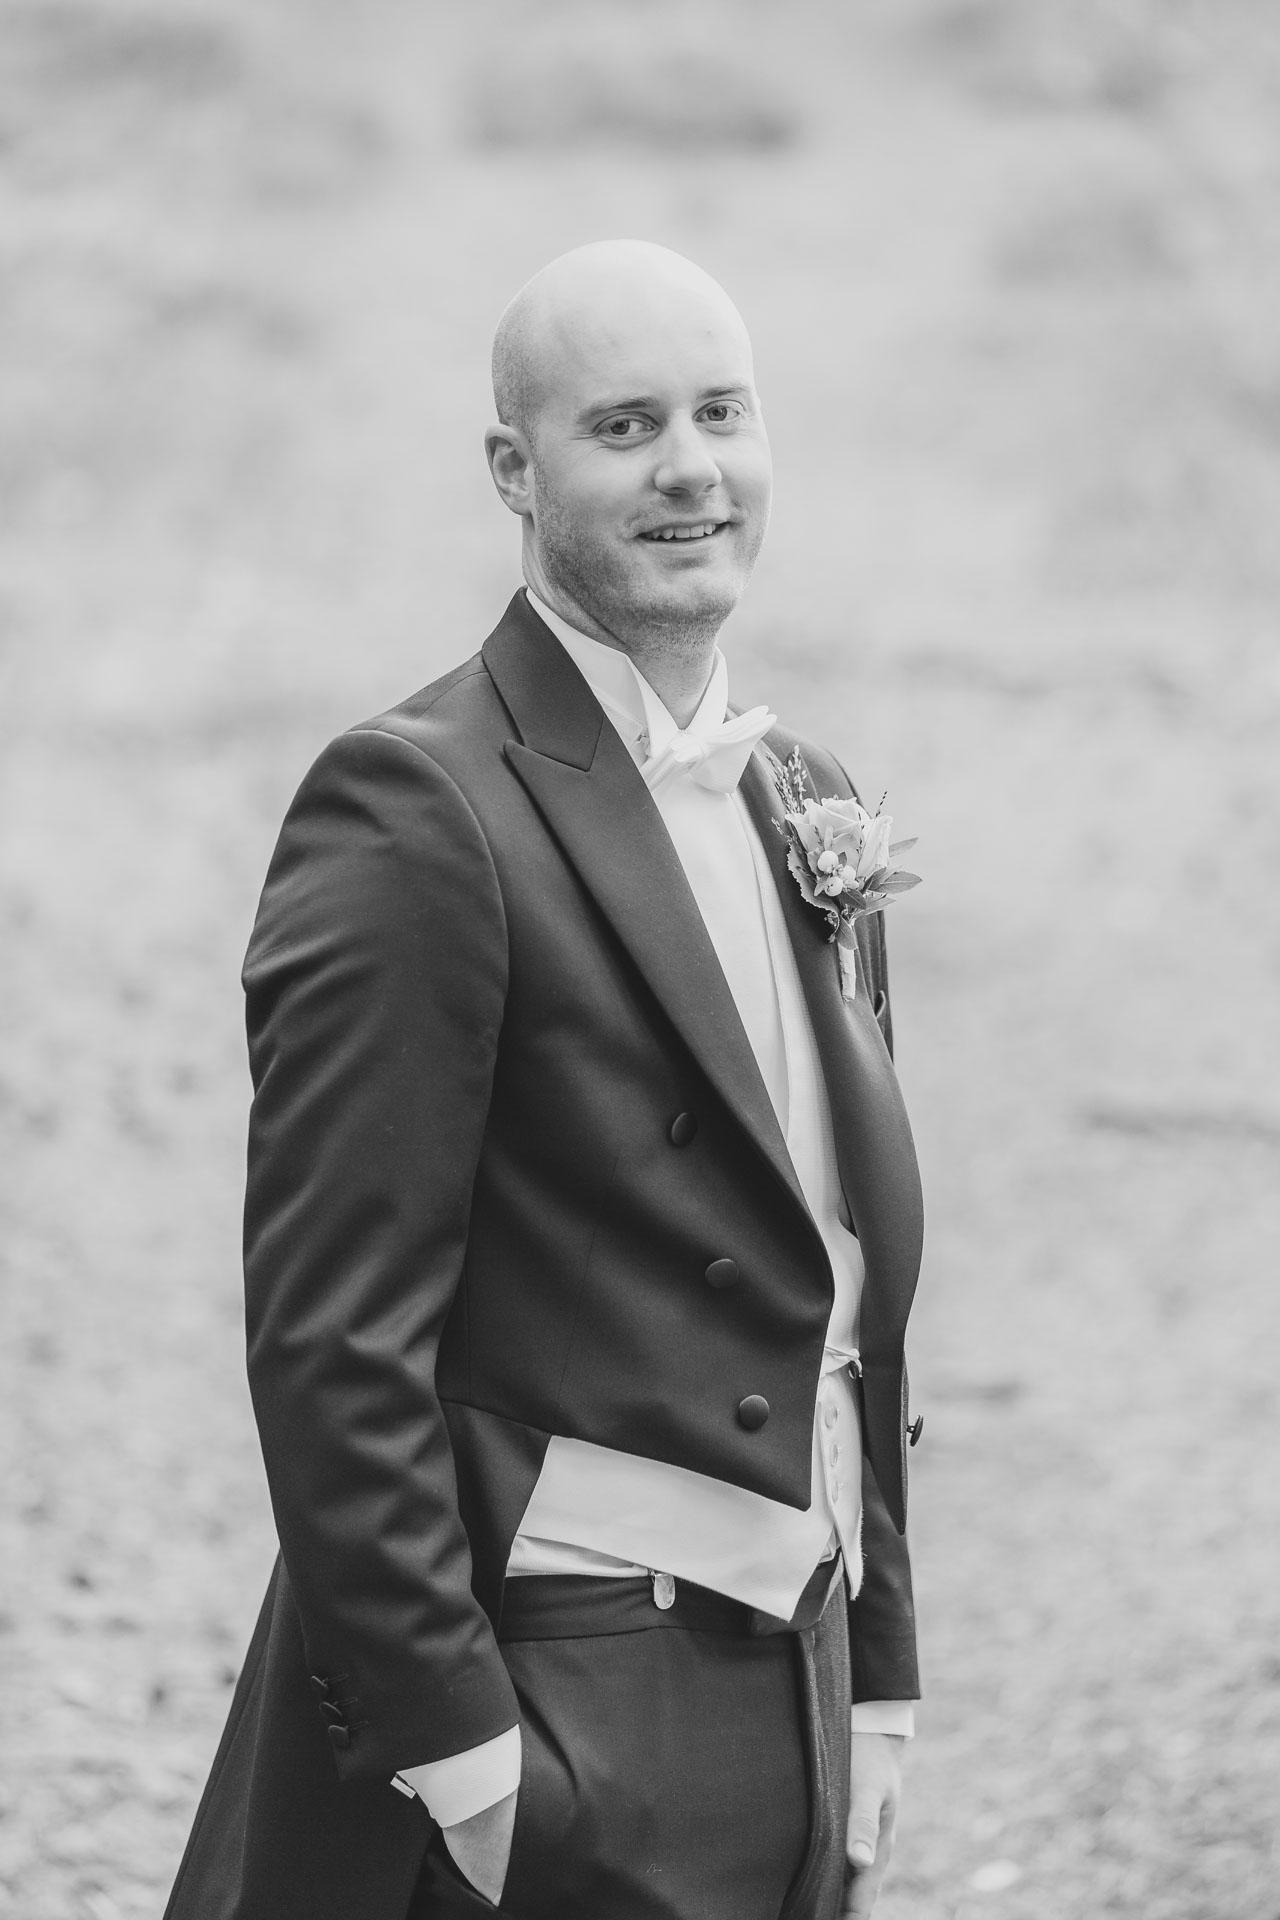 Wedding Photographer In J 246 Nk 246 Ping Bankeryd Habo